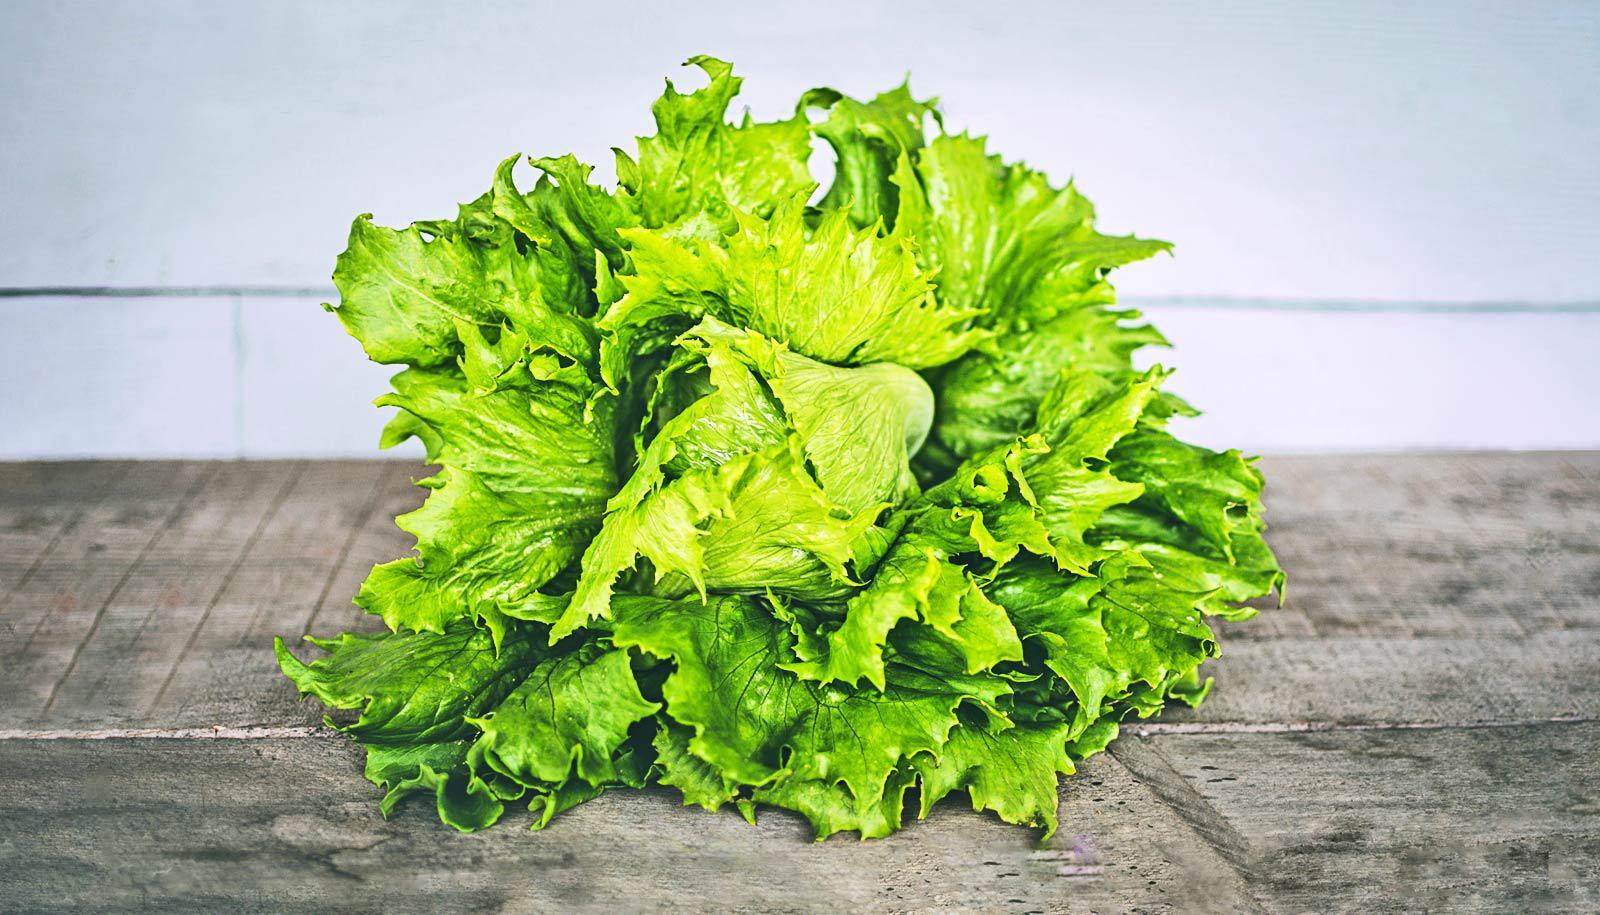 head of lettuce on concrete